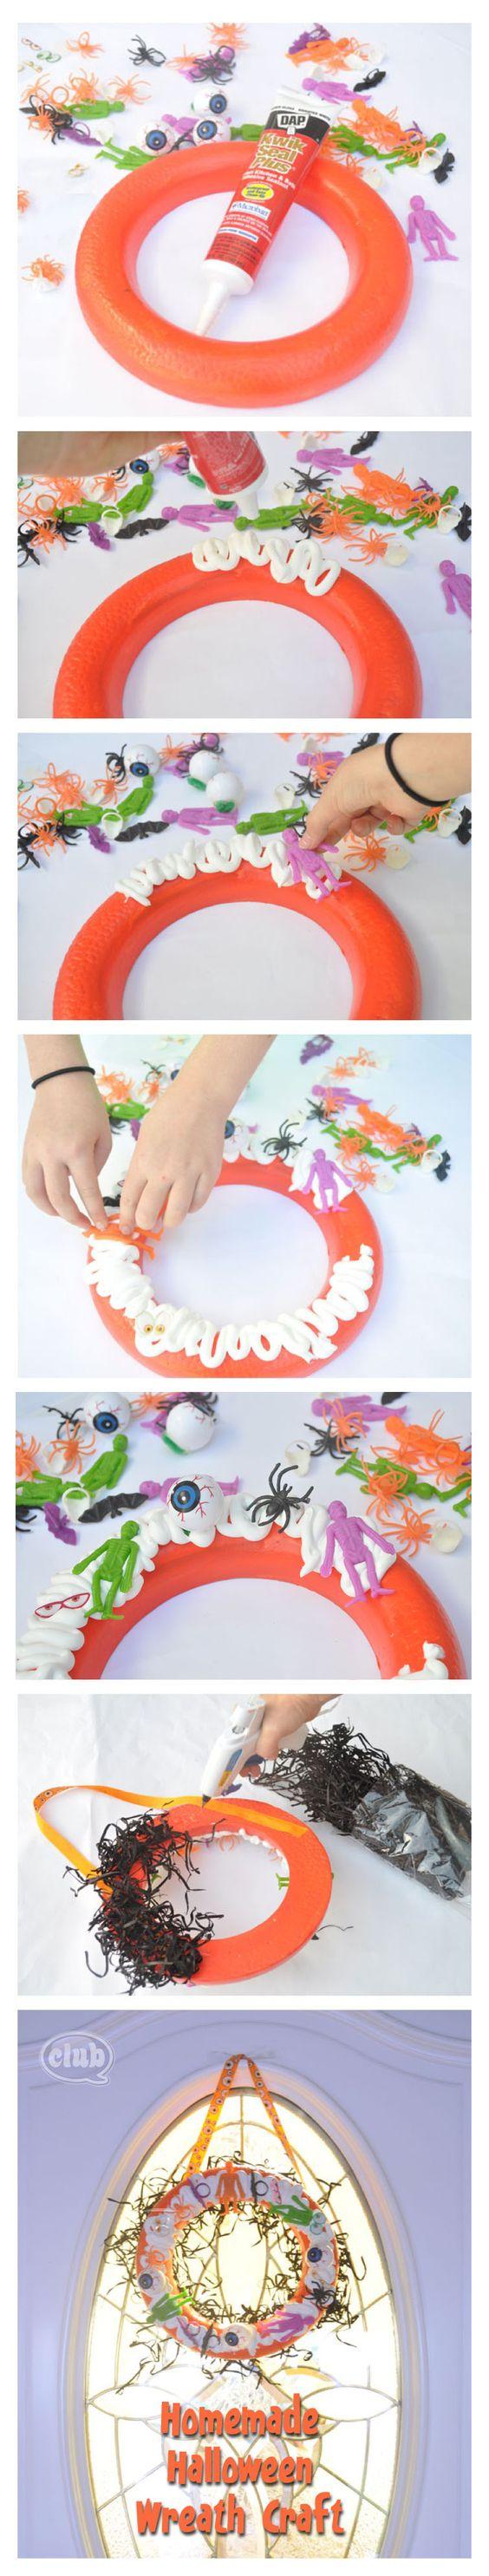 Homemade Halloween Wreath Craft - using Kitchen and Bath sealant ...